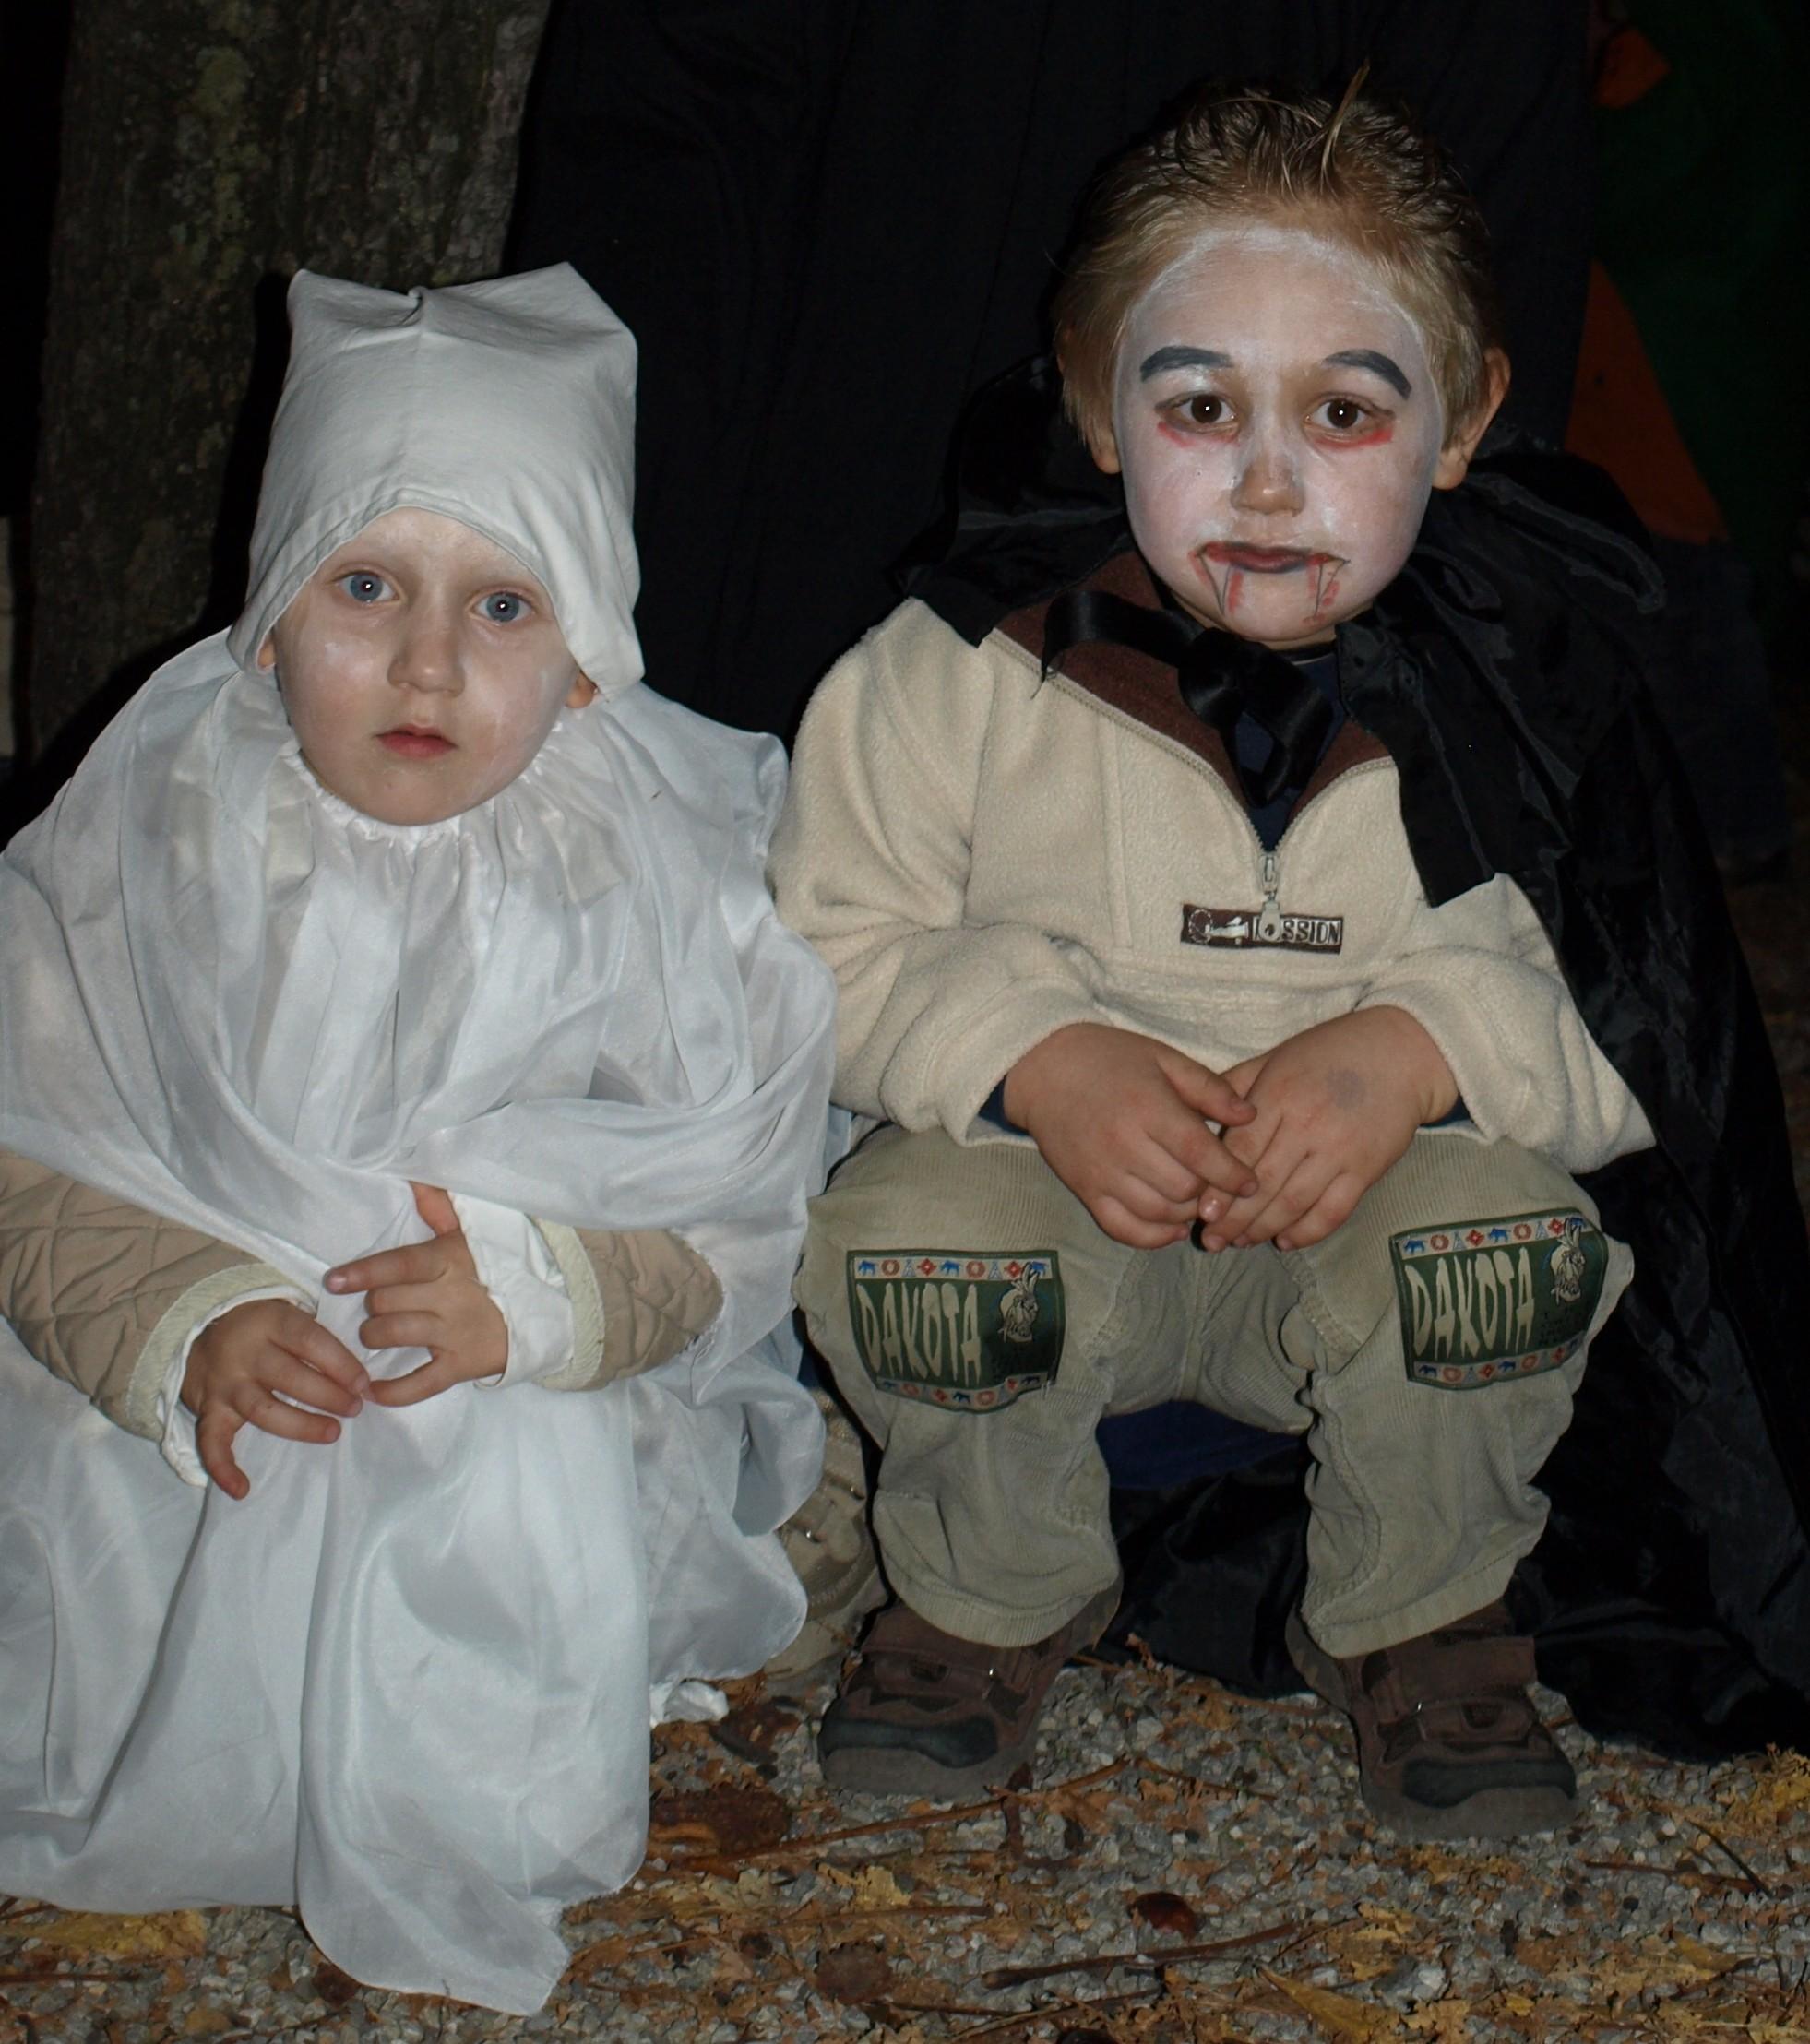 HalloweenI (685k image)